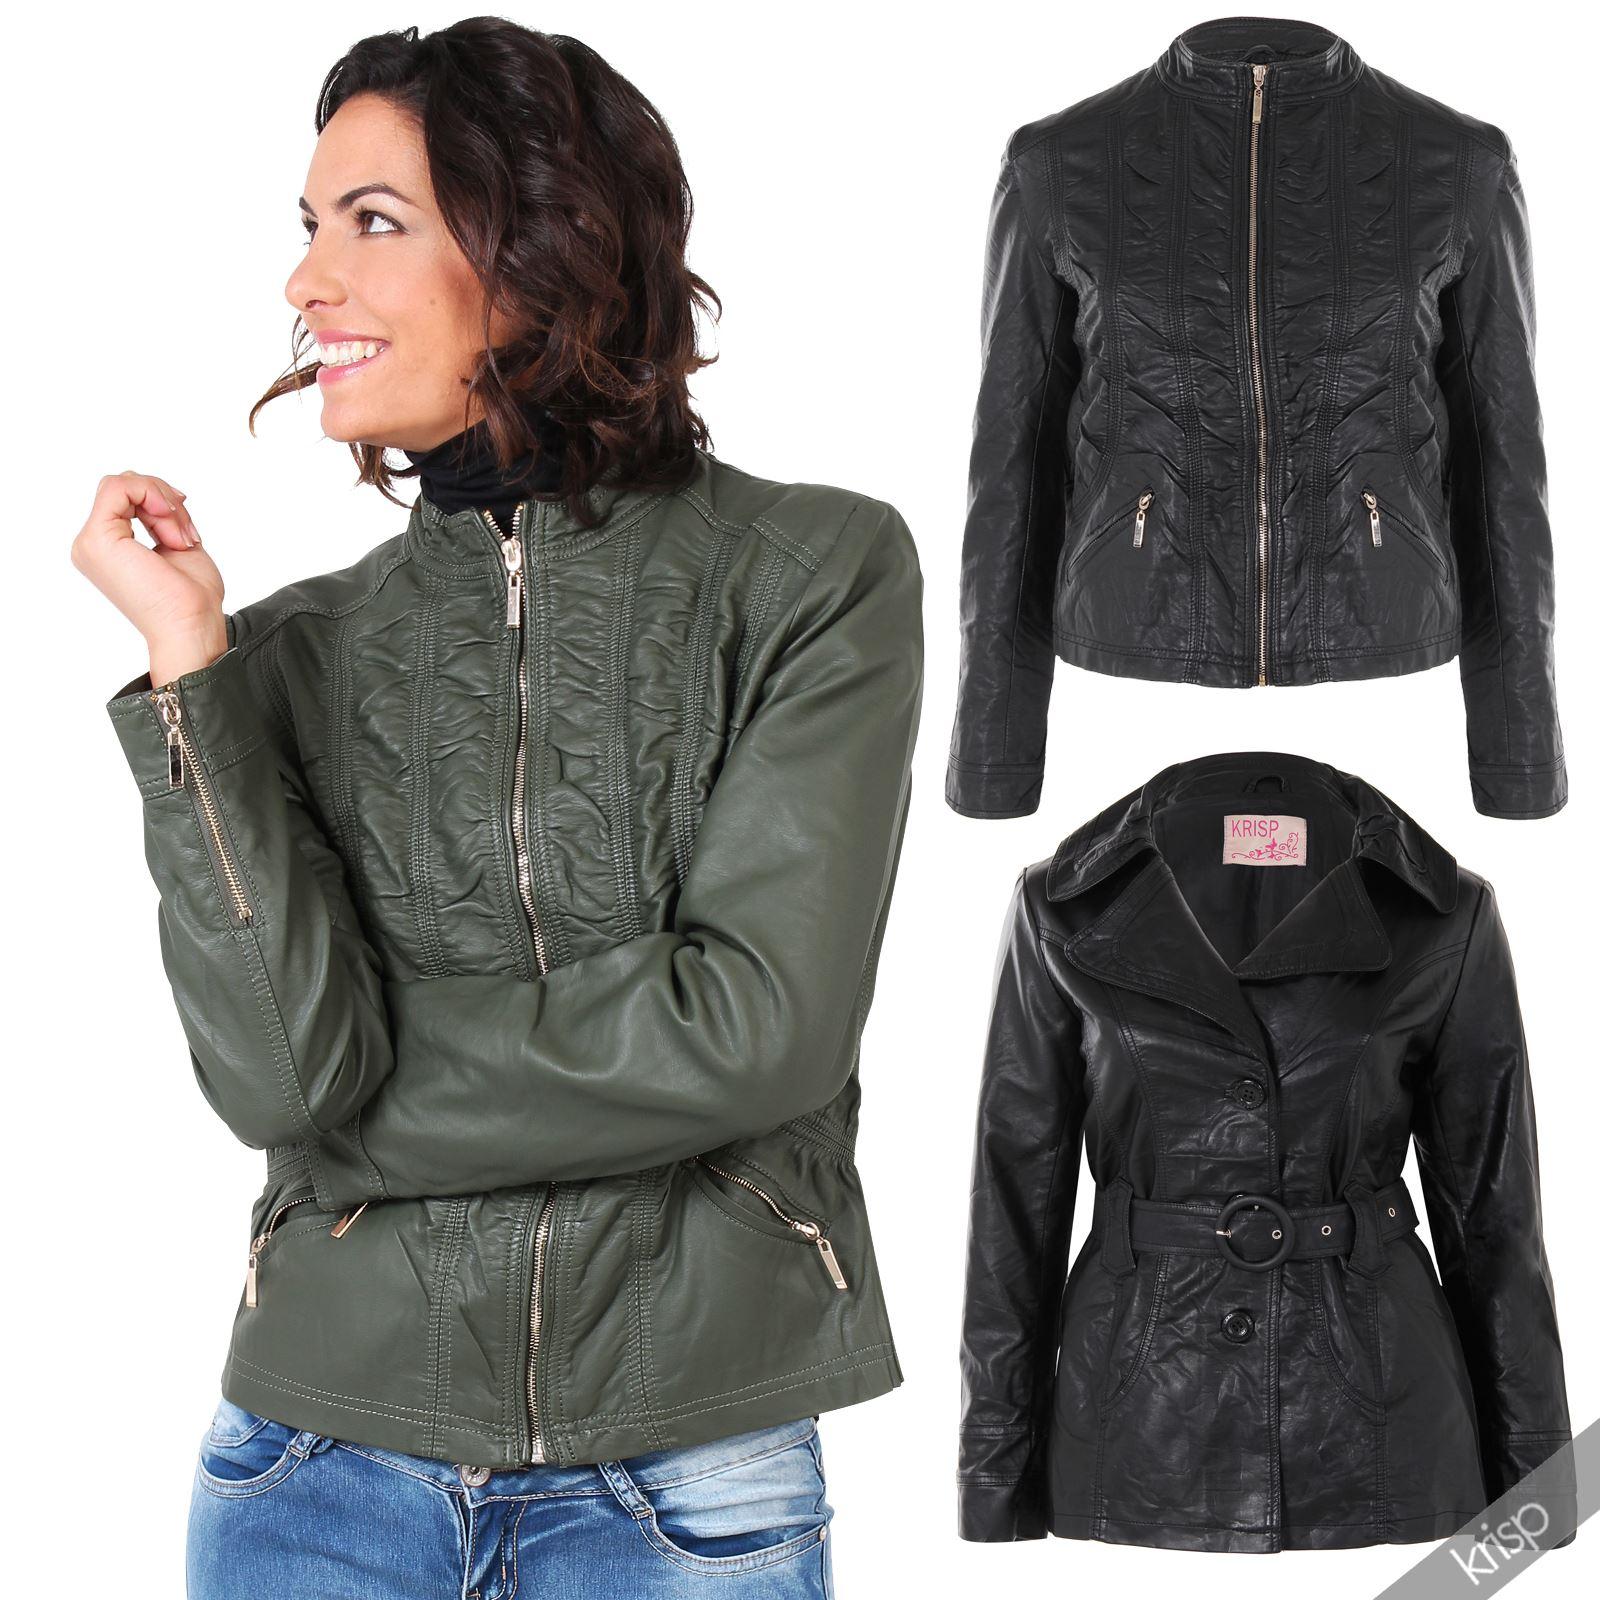 Leather jacket size 18 - Womens Soft Pu Leather Belted Collared Mac Jacket Vintage Coat Plus Size 18 24